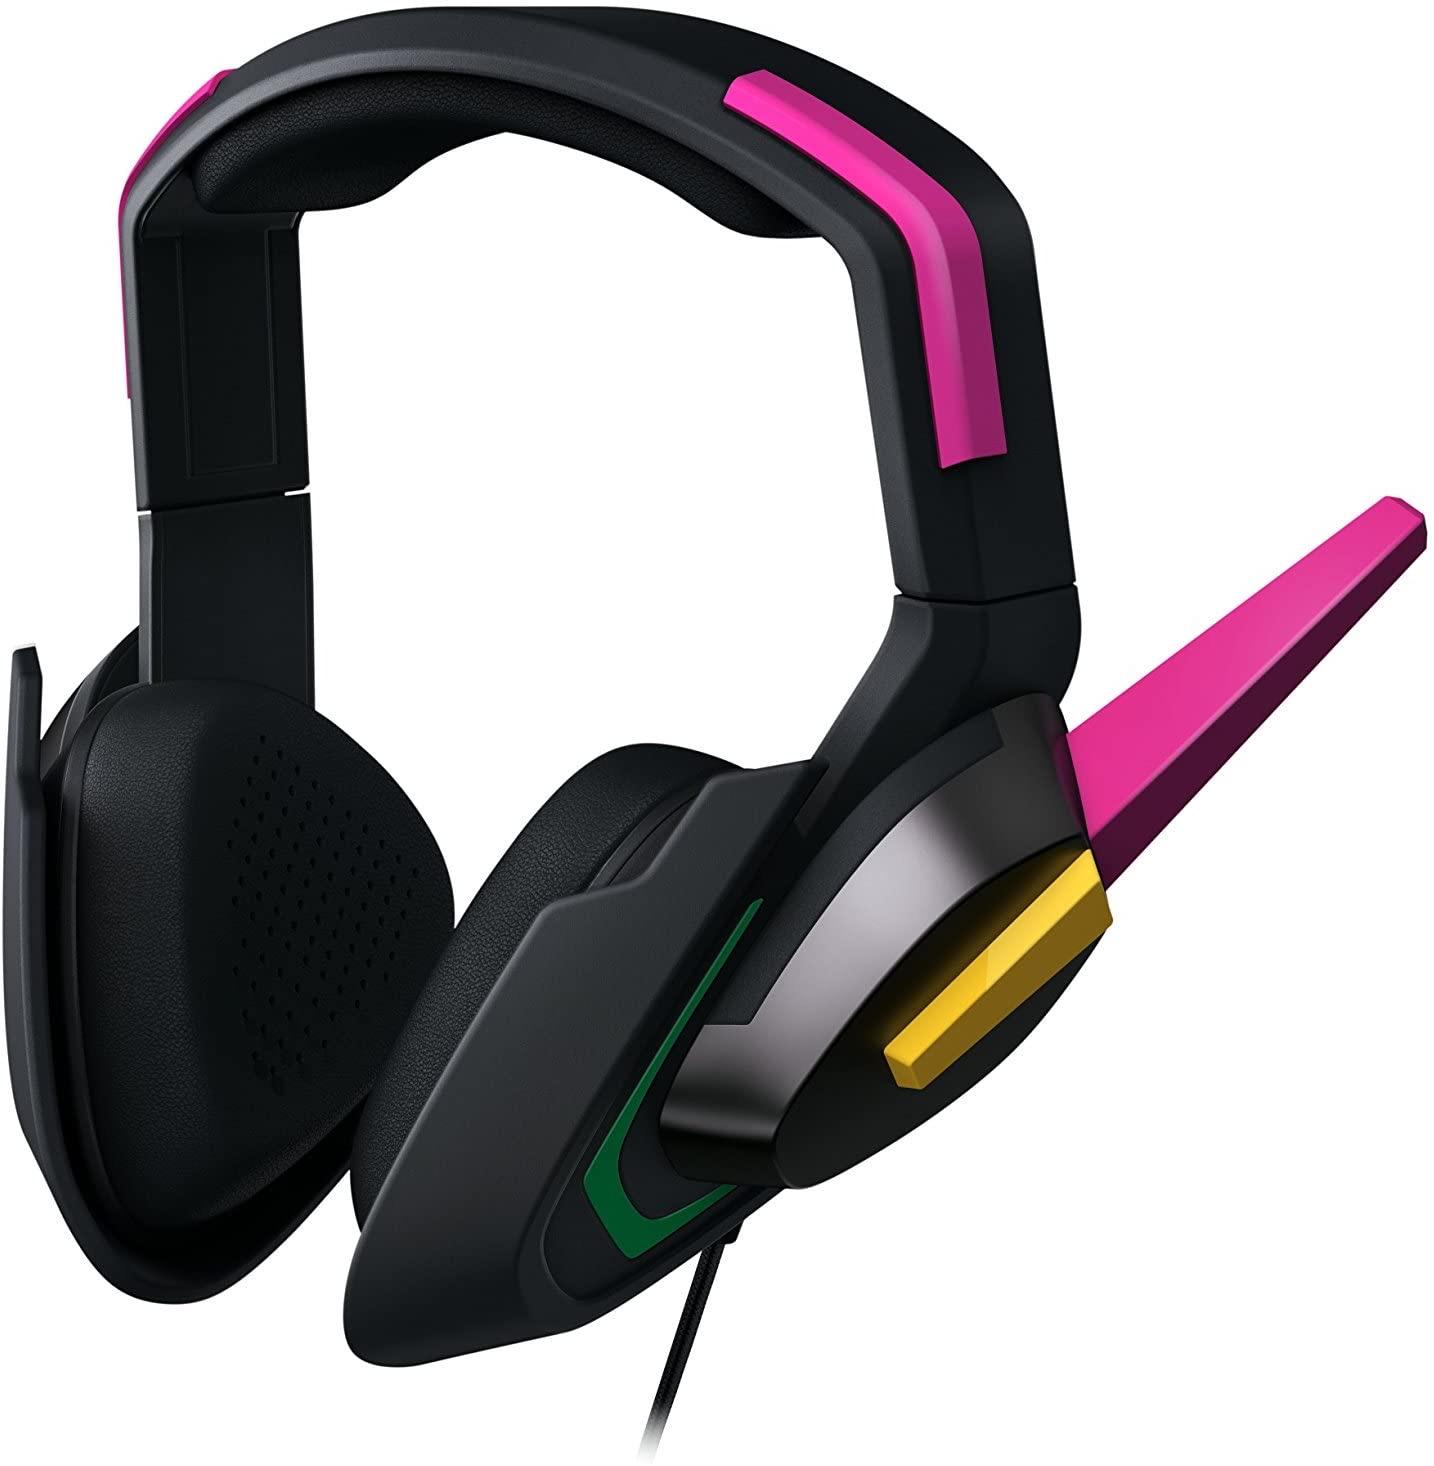 Razer D.Va Headset - RZ04-02400100-R3M1 - BillLentis.com